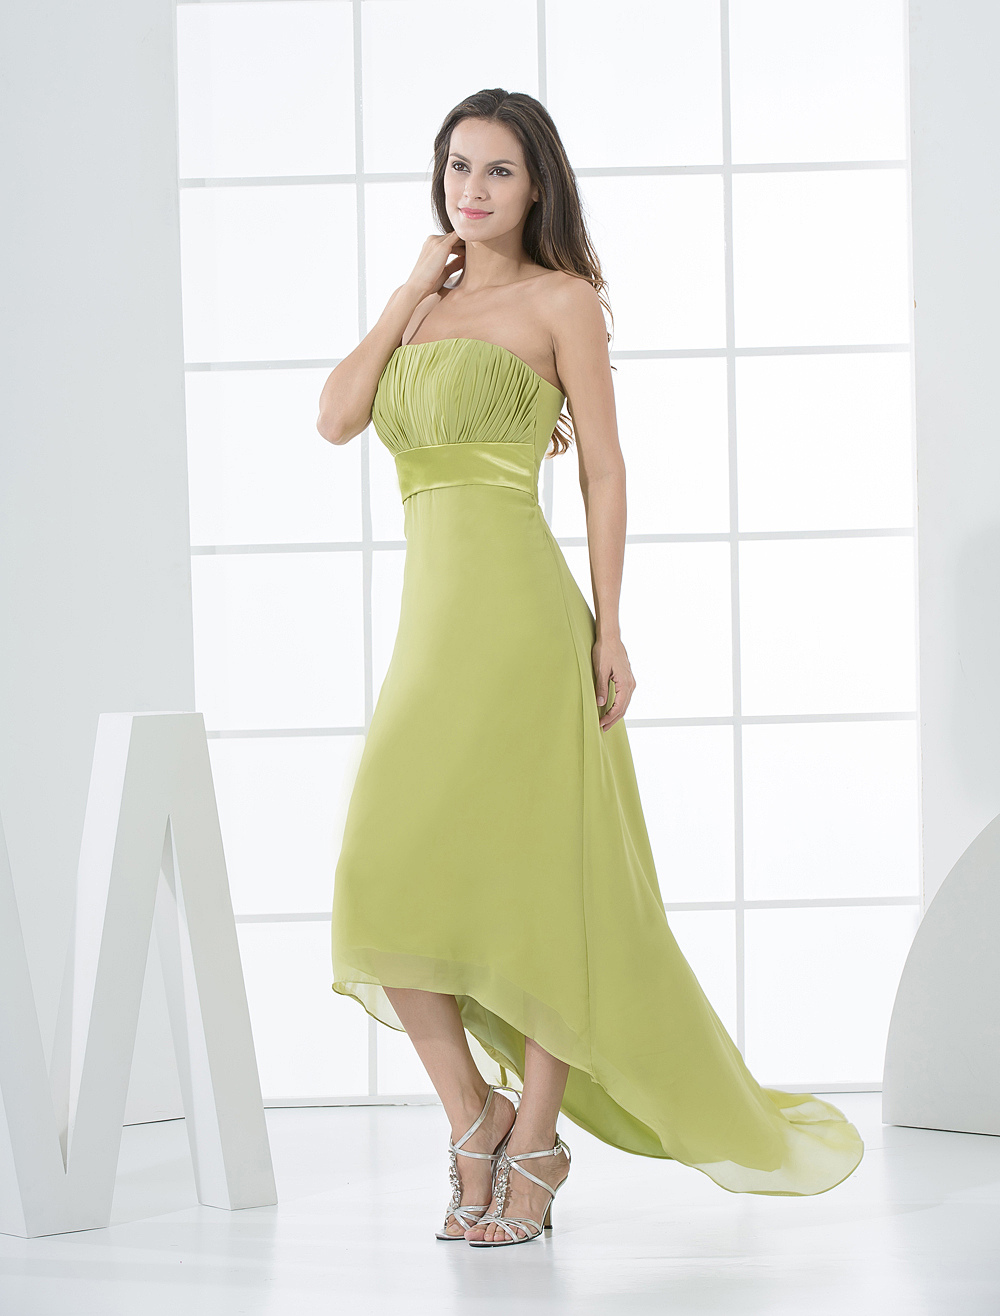 Strapless Daffodil Chiffon High-Low Bridesmaid Dress